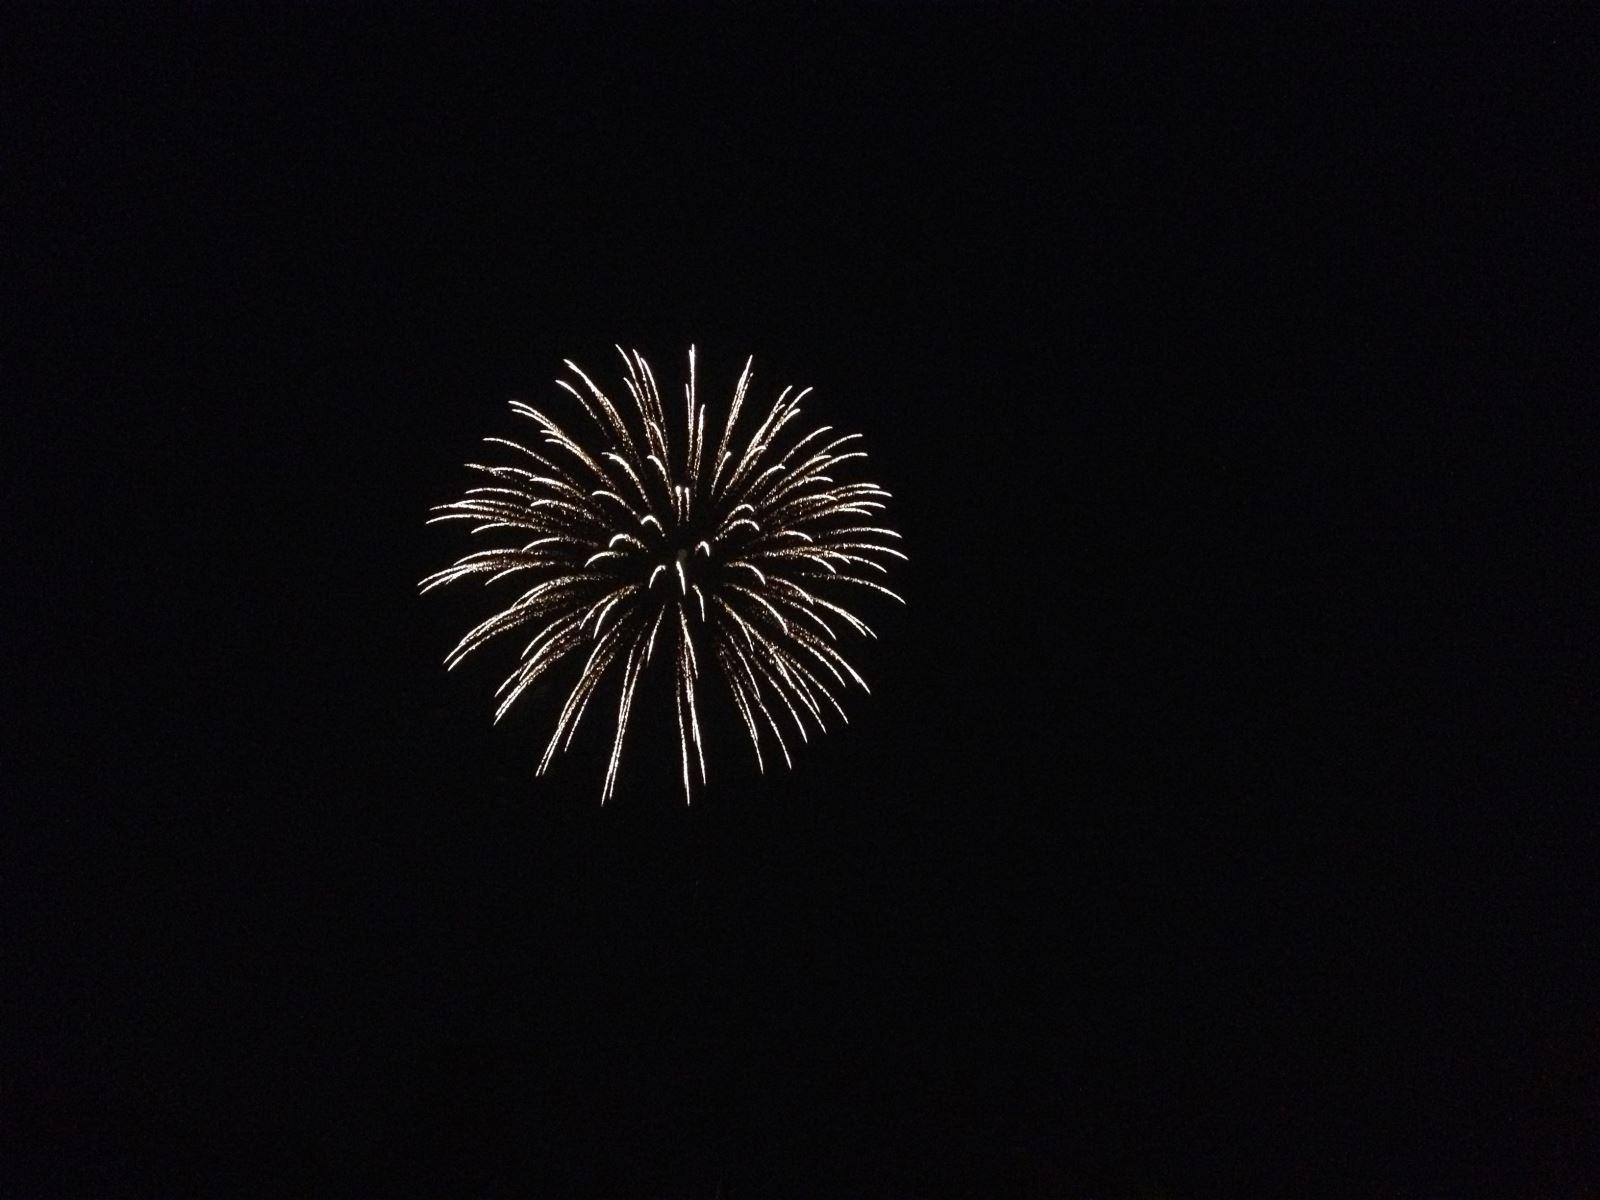 Apple Valley Lake Fireworks Photo by Apple Valley Lake REALTOR Sam Miller